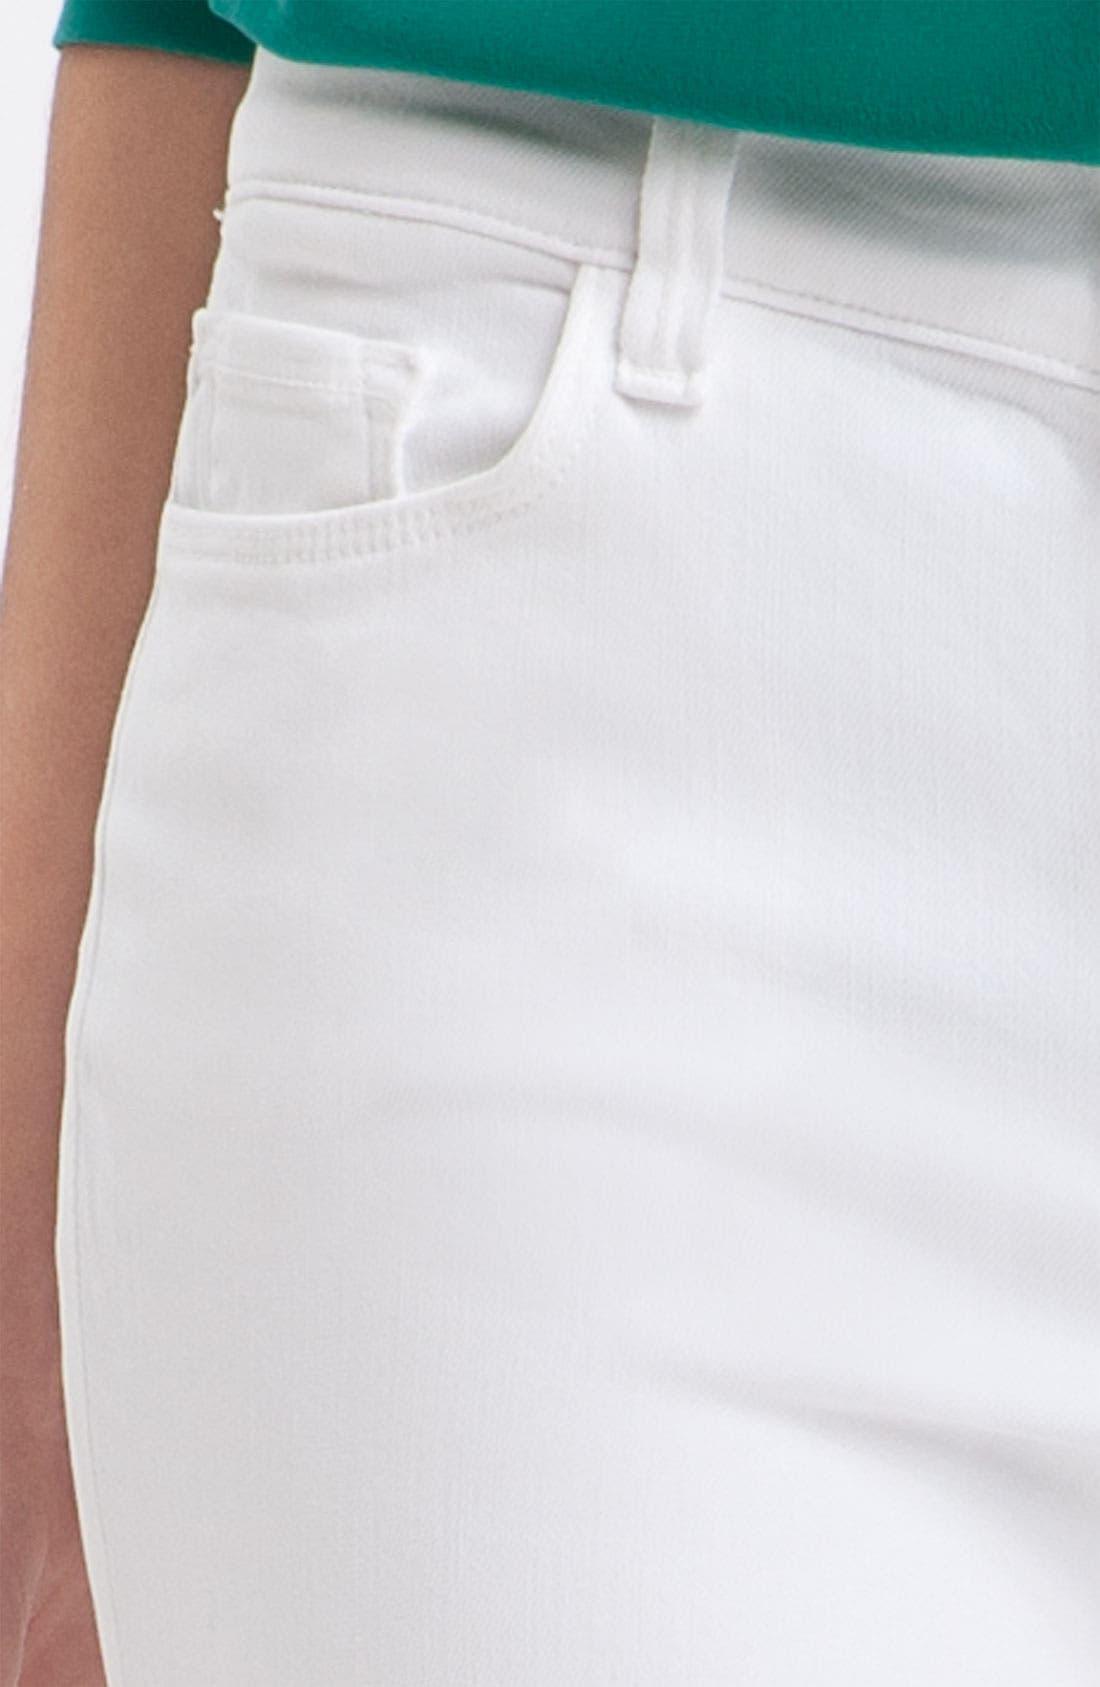 Alternate Image 3  - J Brand Mid-Rise Skinny Jeans (Snow)